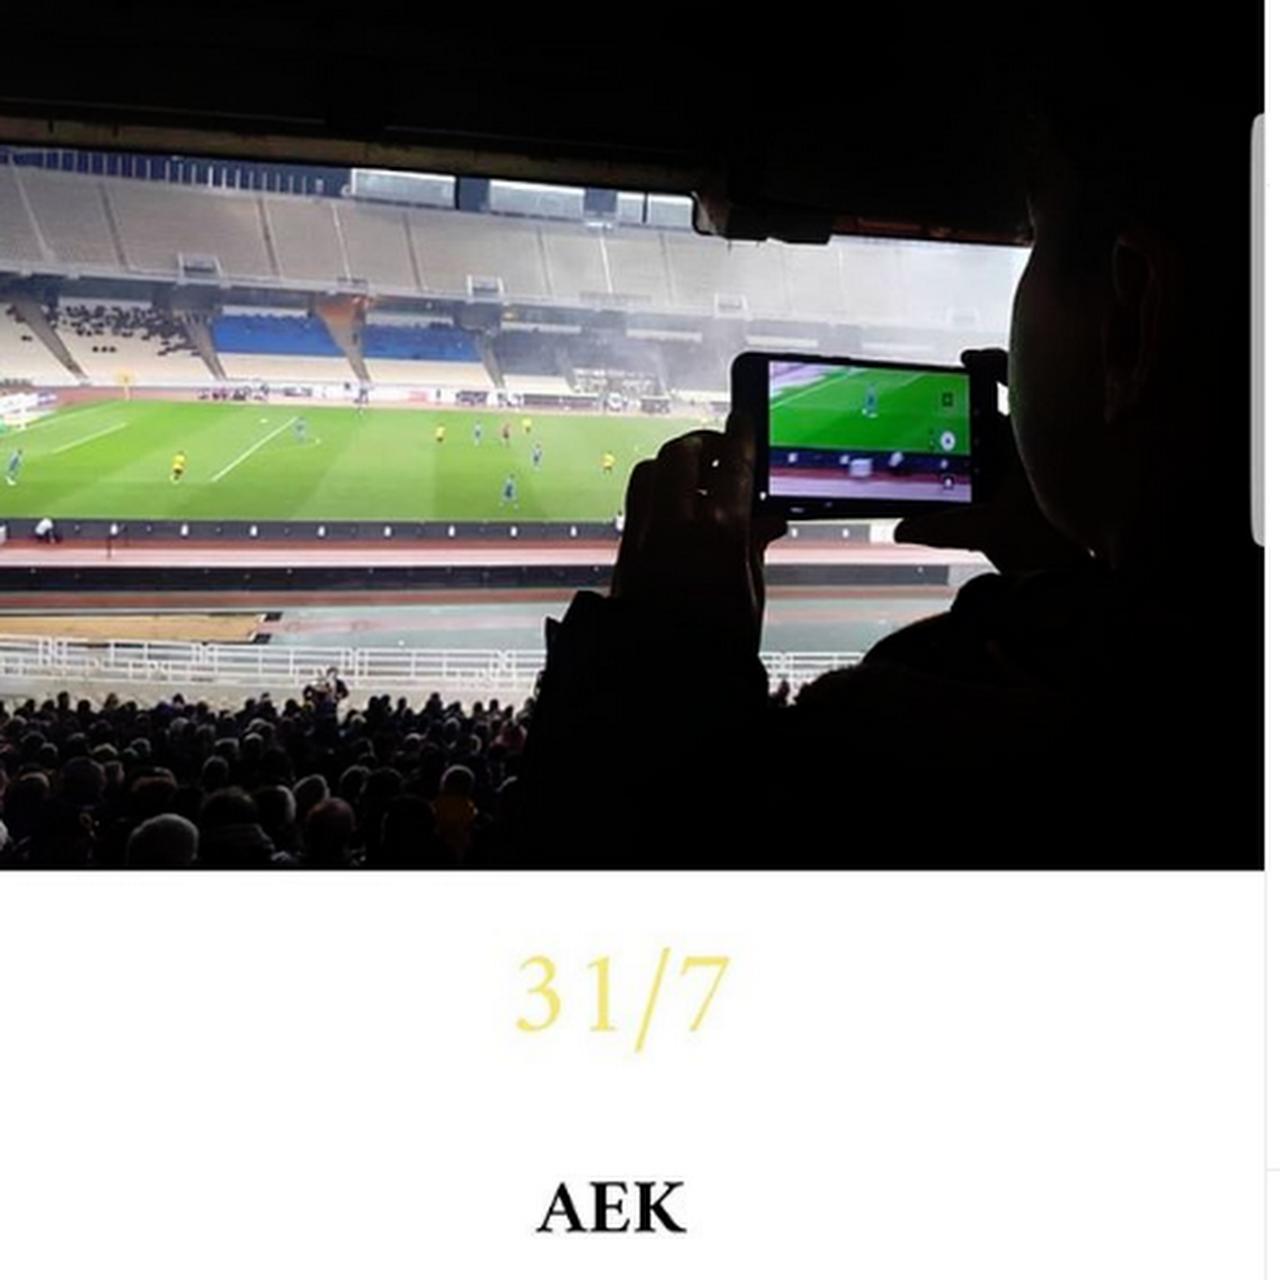 5d8c8f43fca AEK CONCEPT STORE - Μπουτίκ στην τοποθεσία ΝΕΑ ΦΙΛΑΔΕΛΦΕΙΑ